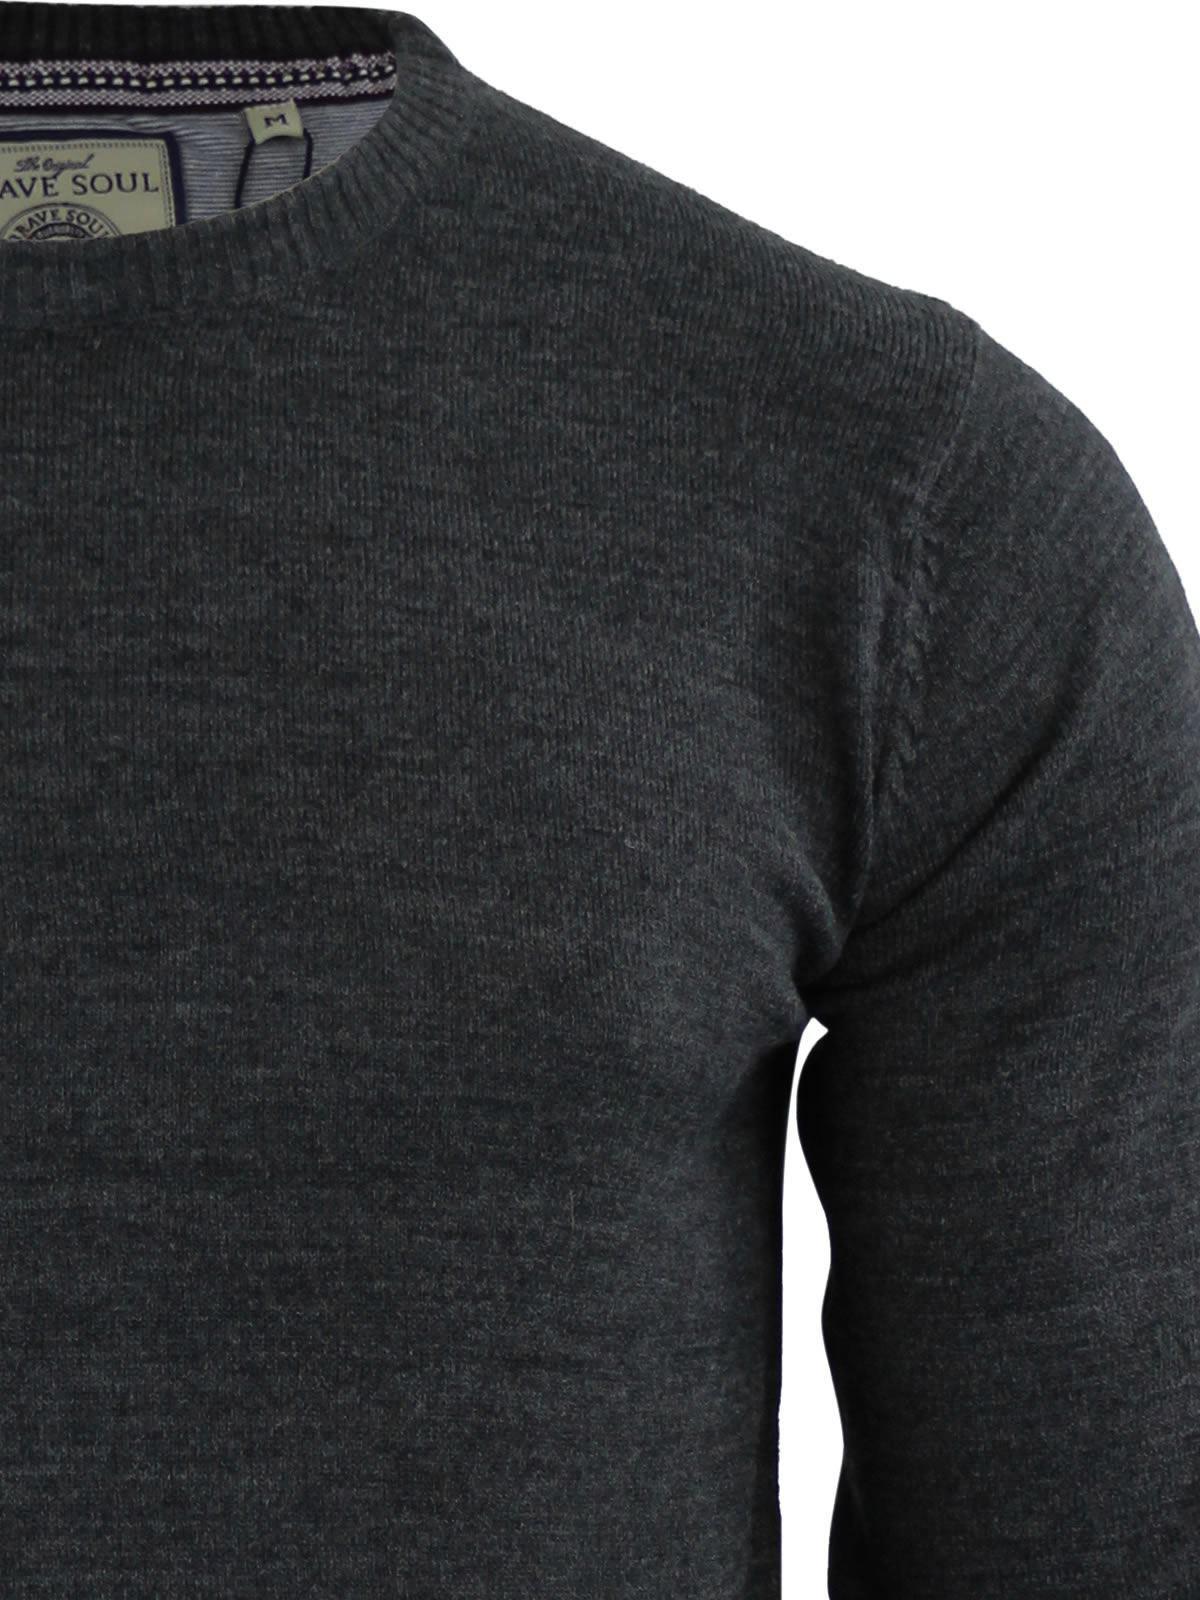 Mens-Jumper-Brave-Soul-Urbain-Knitted-Crew-Neck-Sweater thumbnail 16